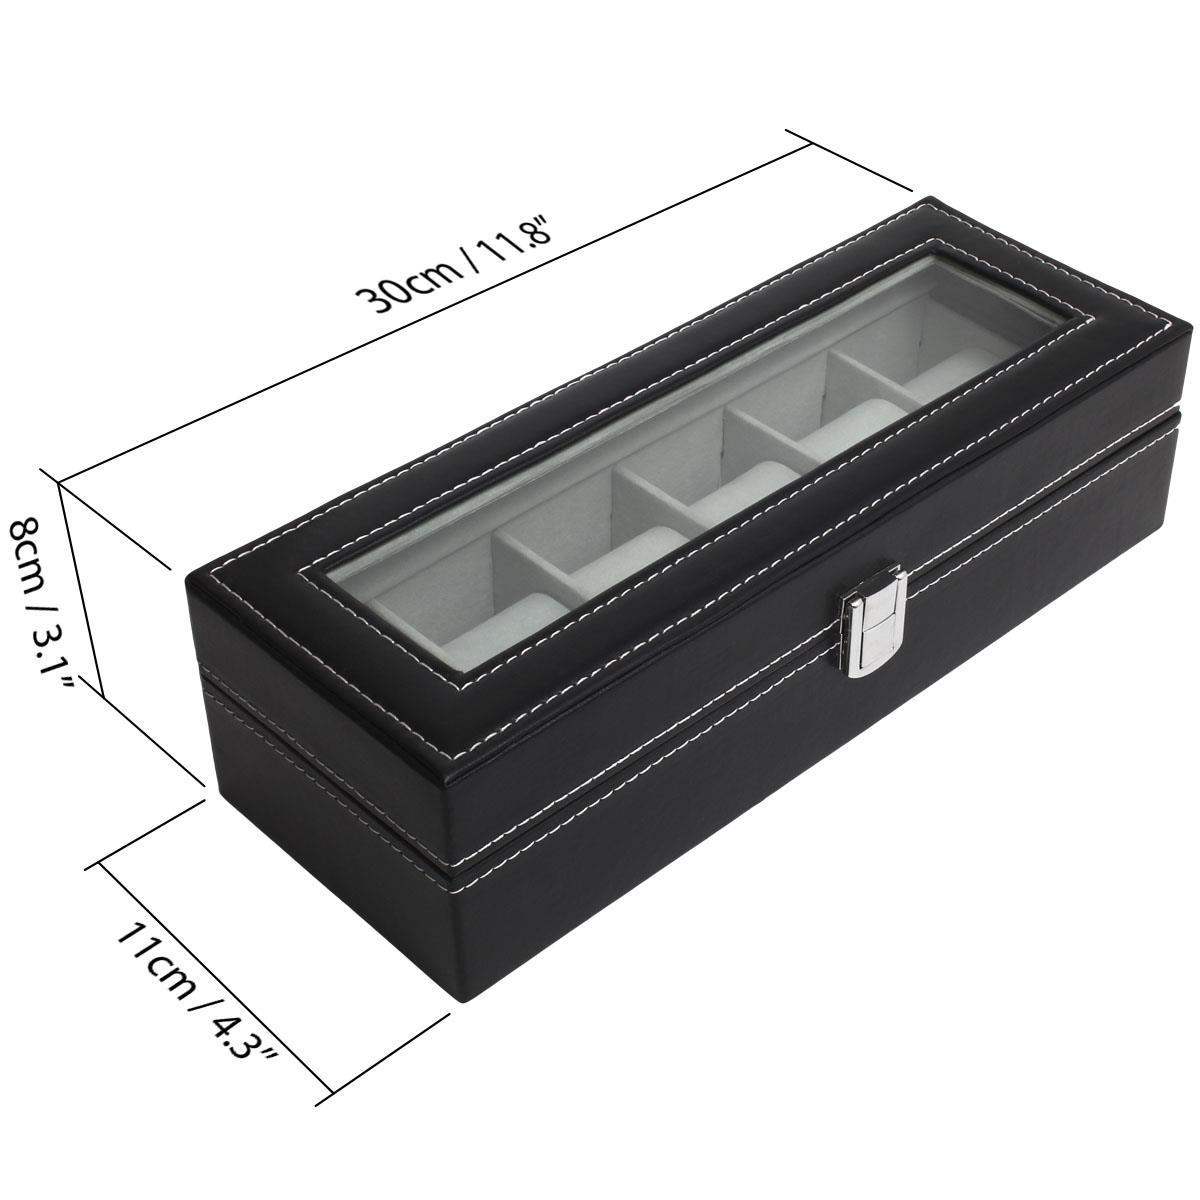 6-12-Watch-Case-Display-Box-Storage-Travel-Men-Women-Ladies-Gents-Jewellery thumbnail 3